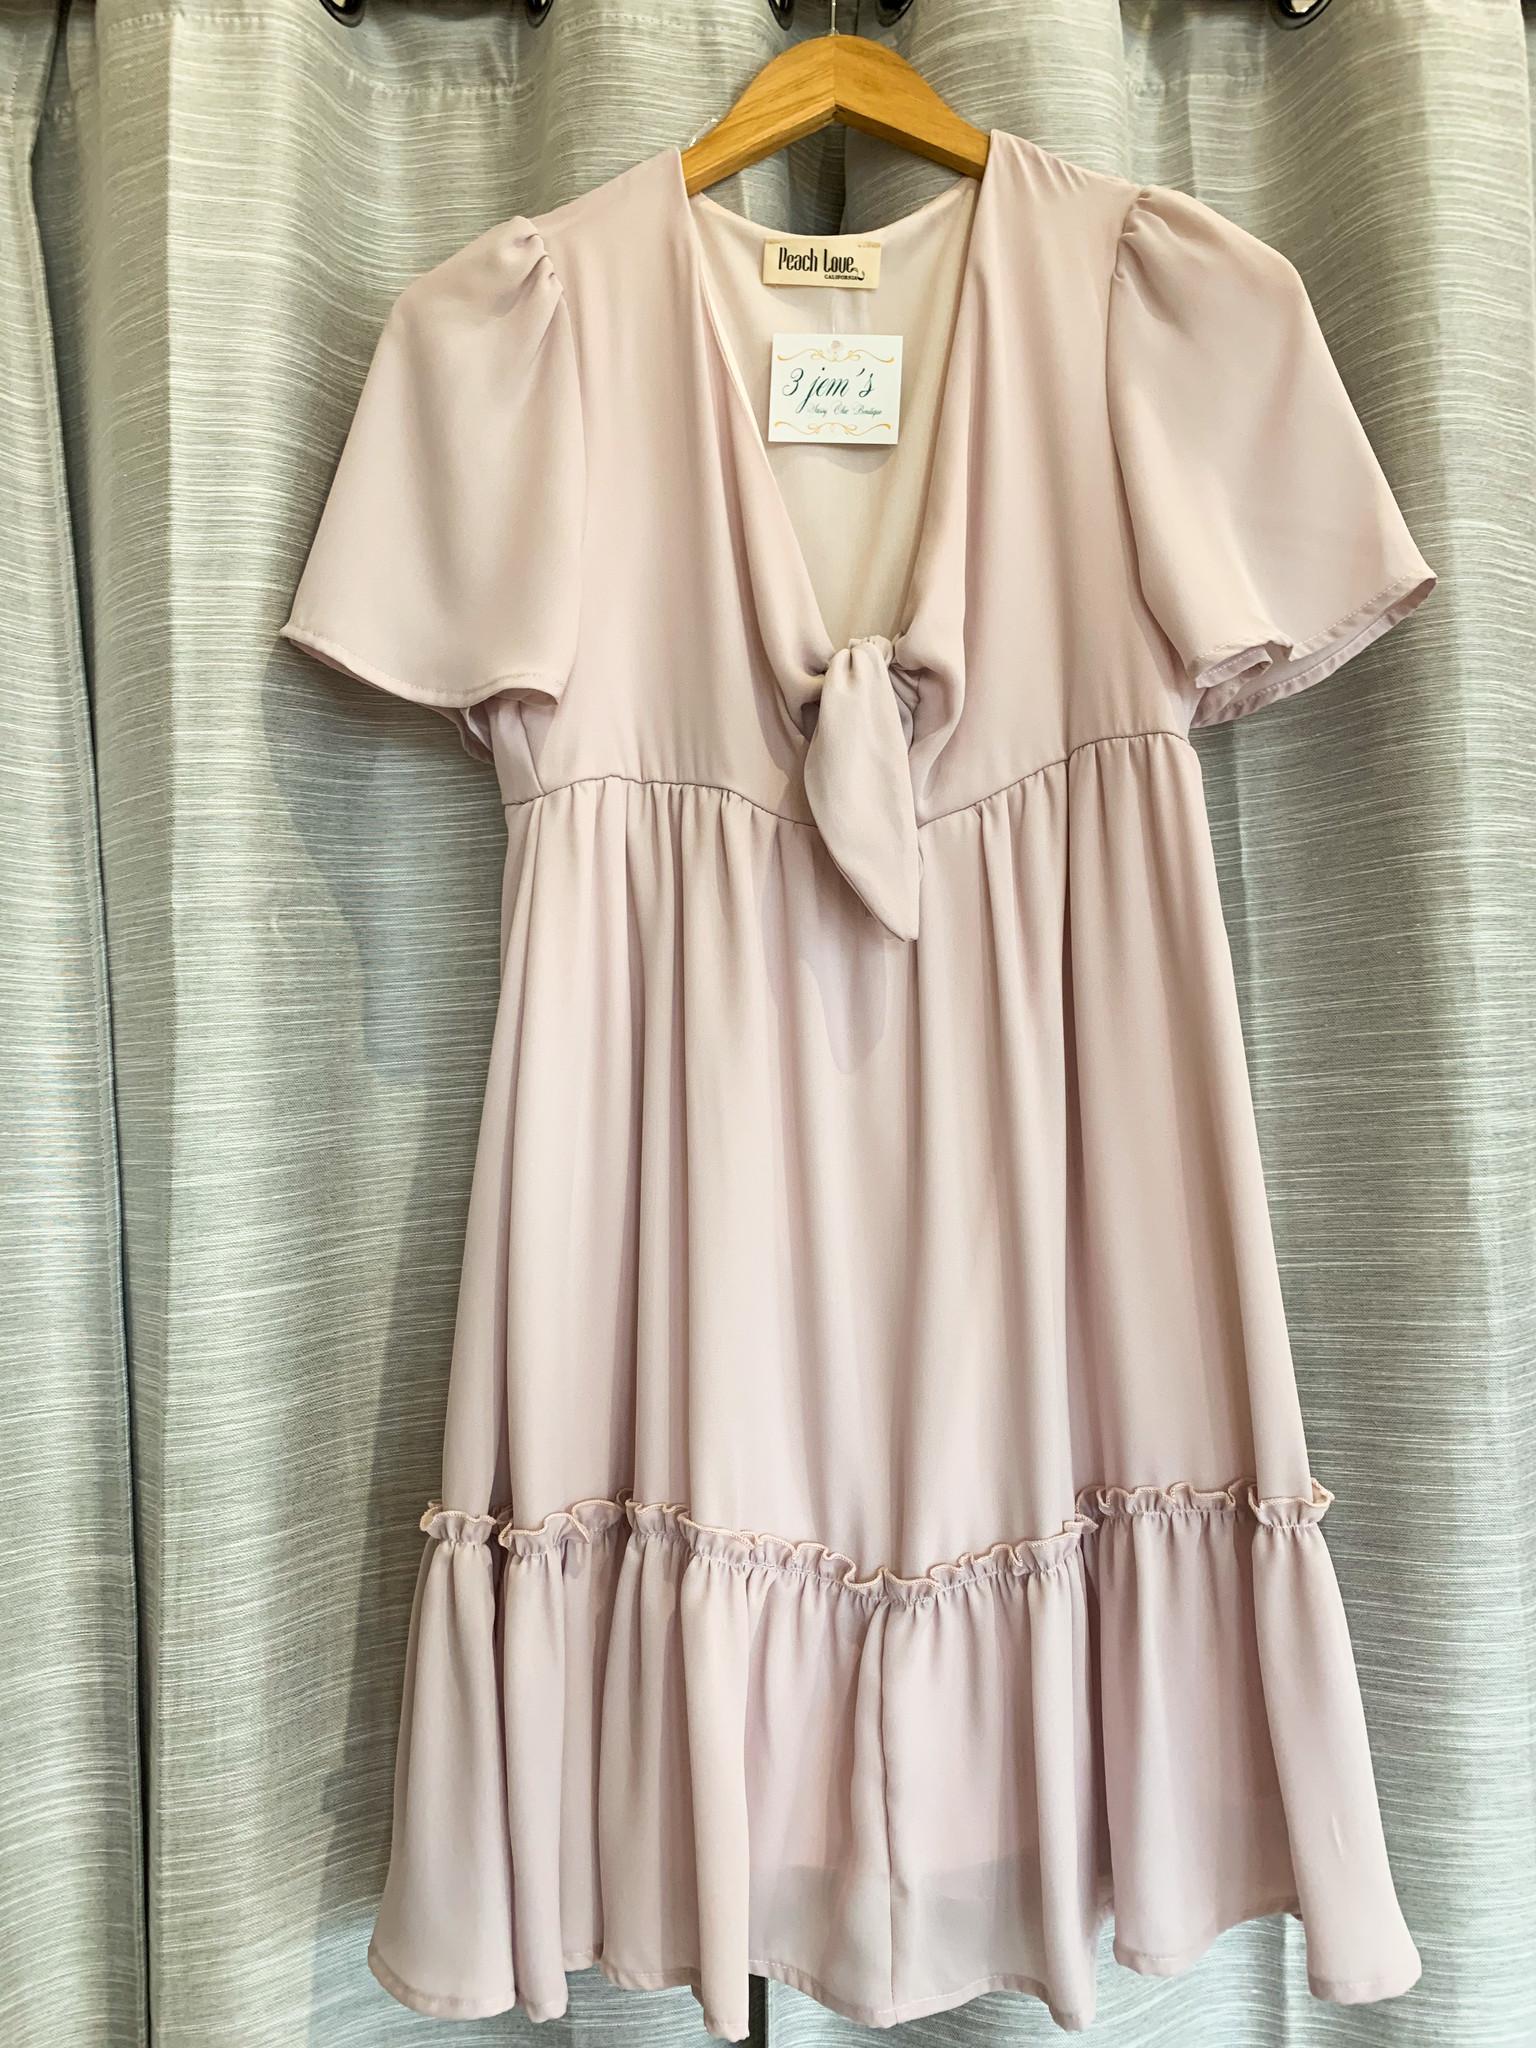 Nude Short Sleeve Ruffle Dress